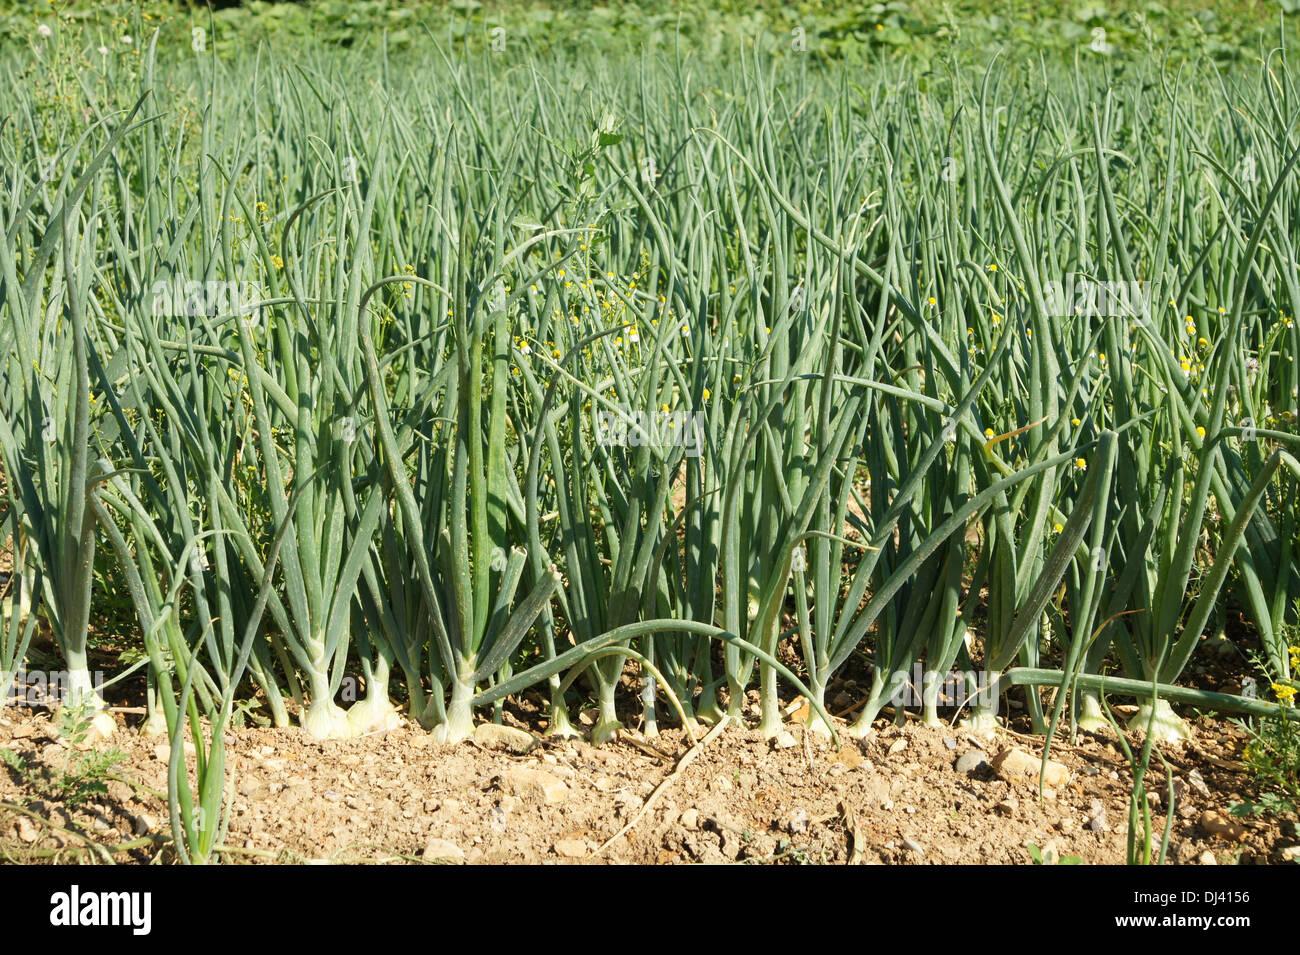 Allium Cepa, Speisezwiebeln, Zwiebeln Stockbild